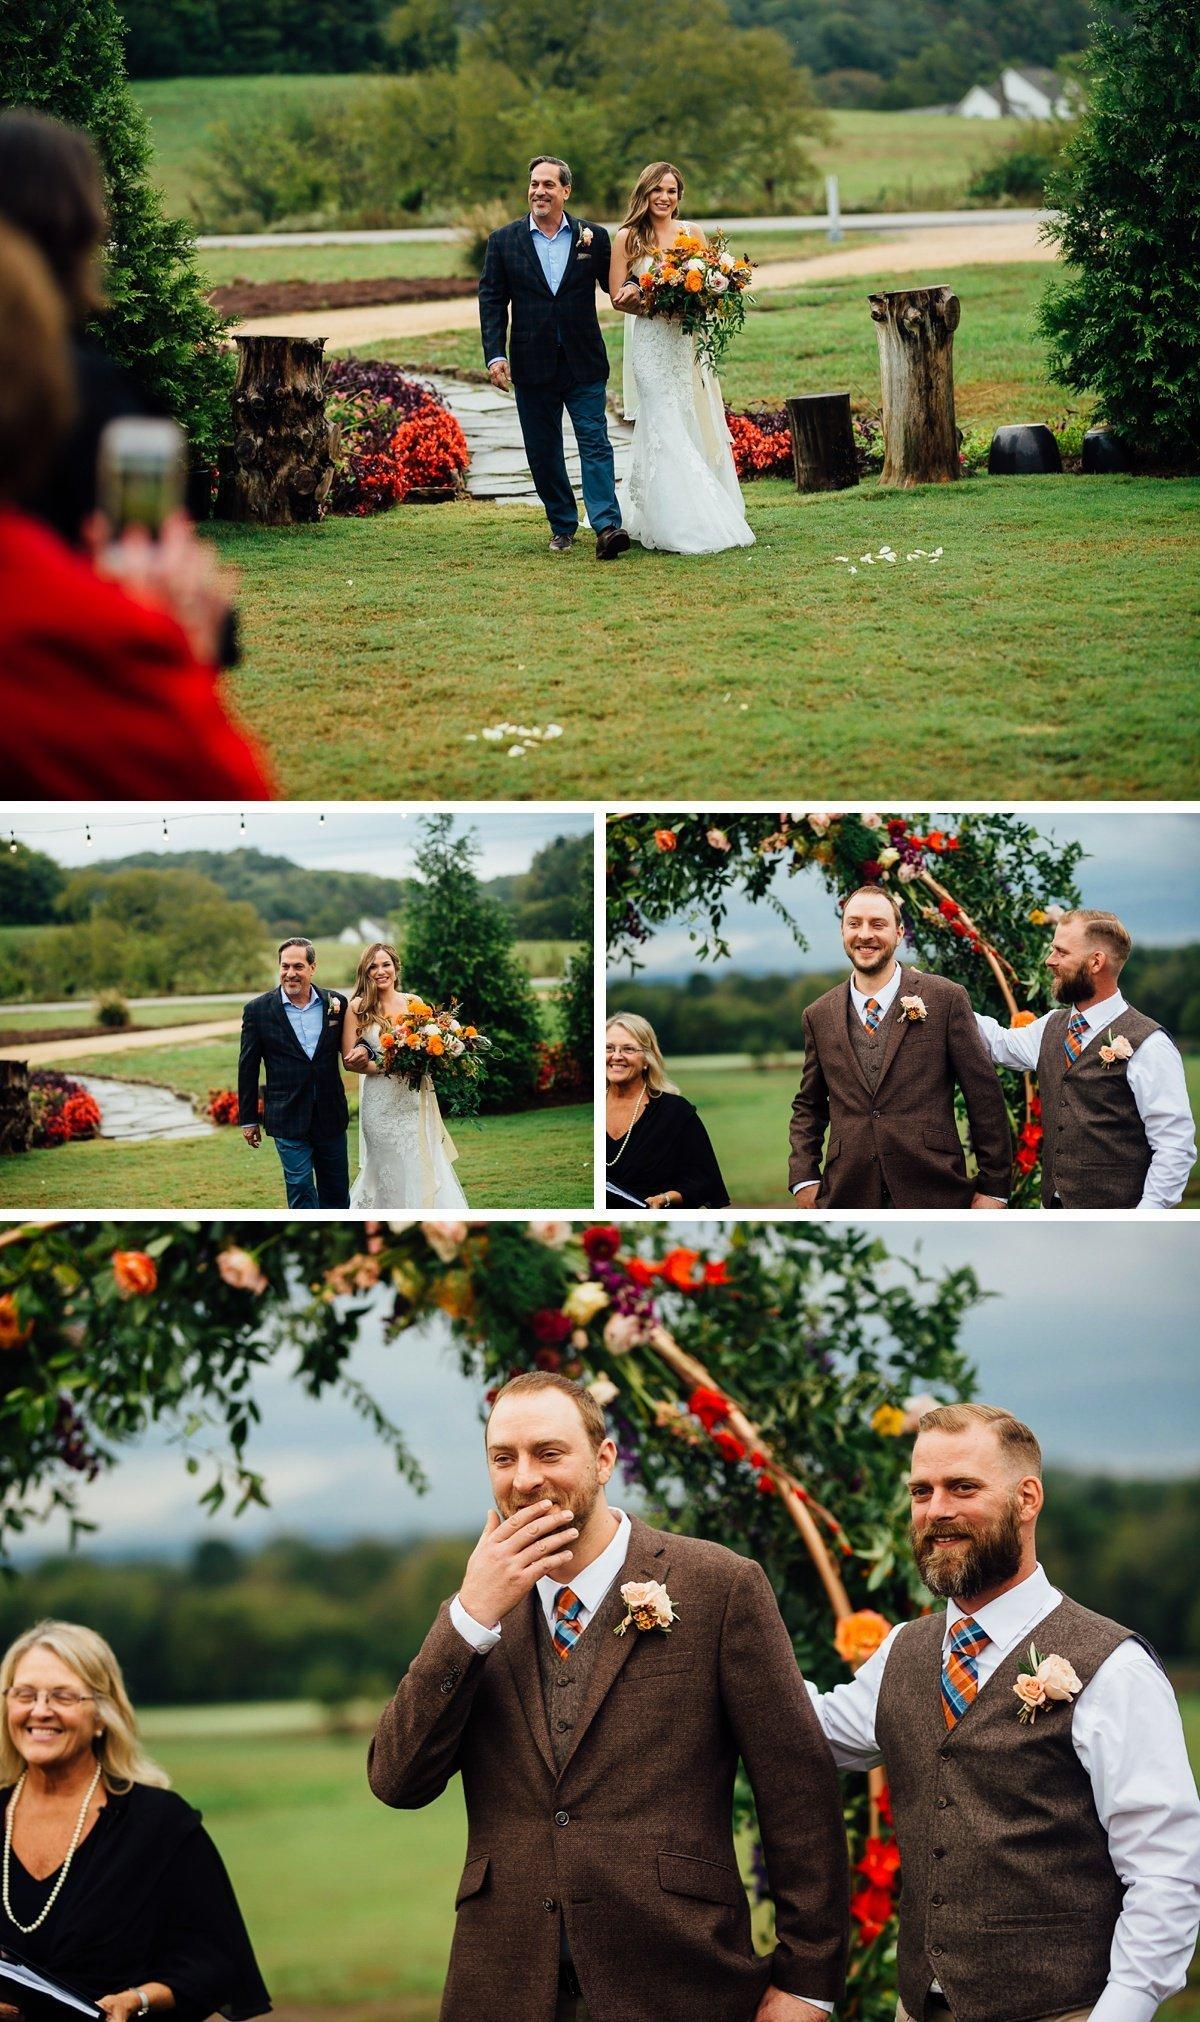 groom-reaction-to-bride Allenbrooke Farms | Spring Hill TN Wedding | Sam and Kaleb